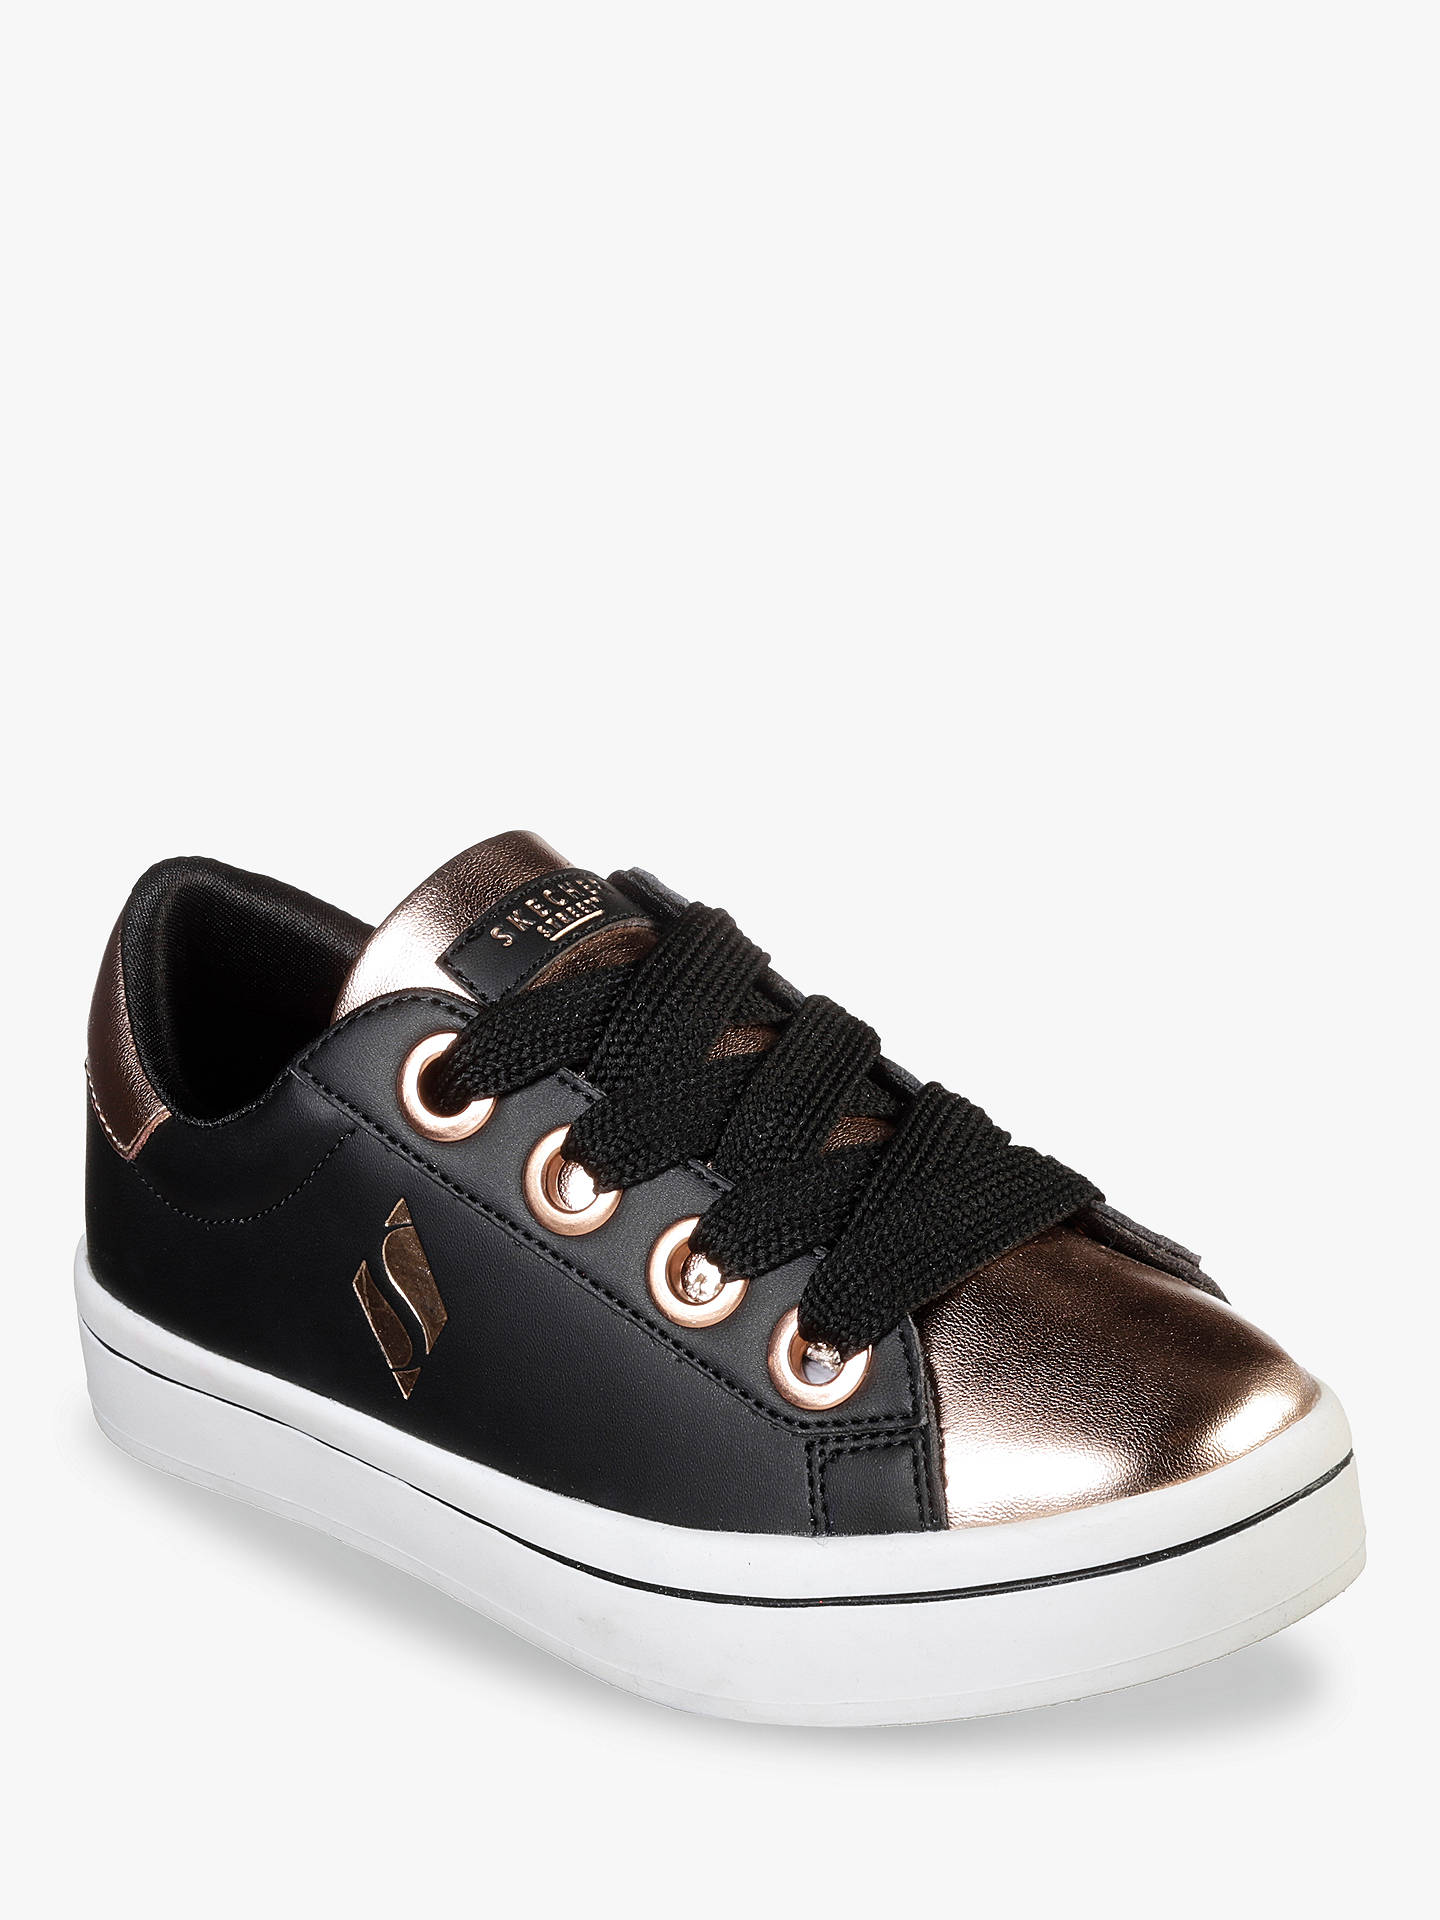 a61f99744af9 Buy Skechers Children s Hi Lite Metallic Lace Up Trainers